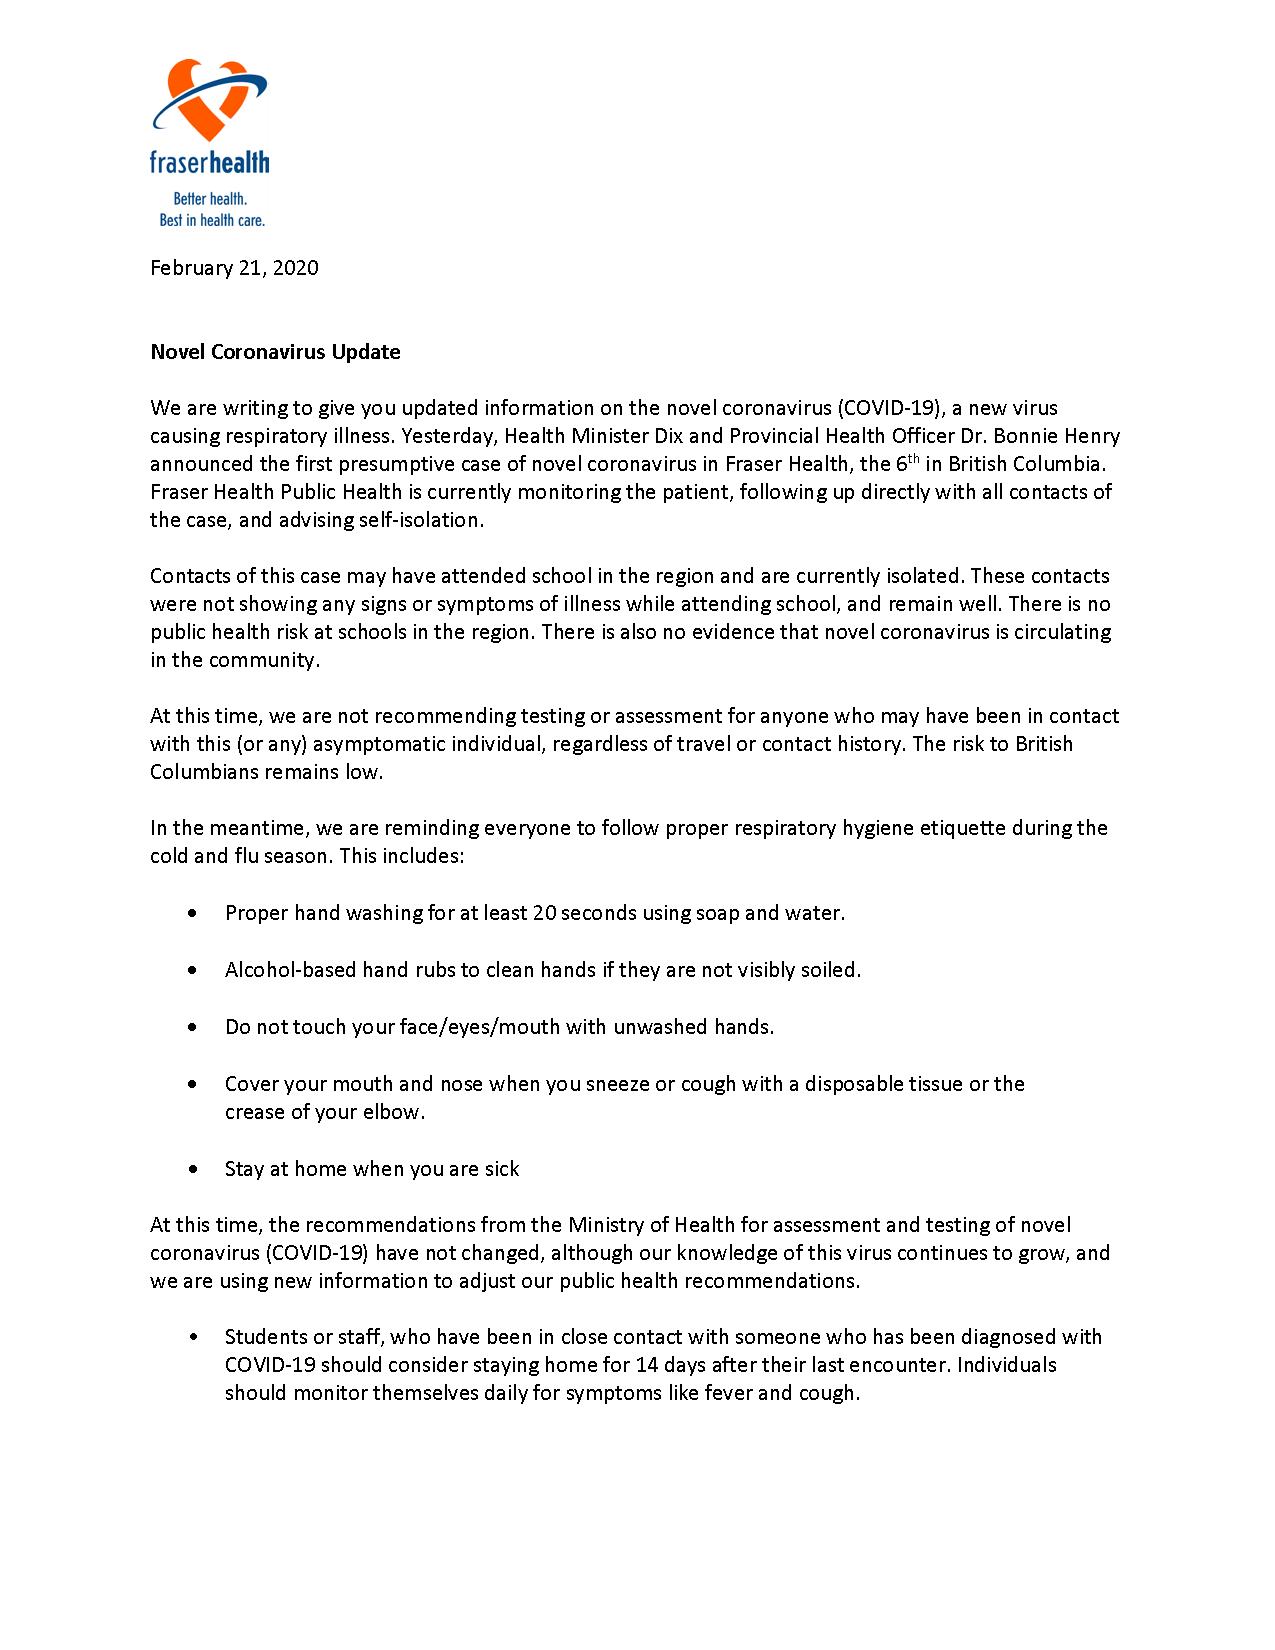 Novel Coronavirus Update - F. East_21Feb2020_Page_1.png